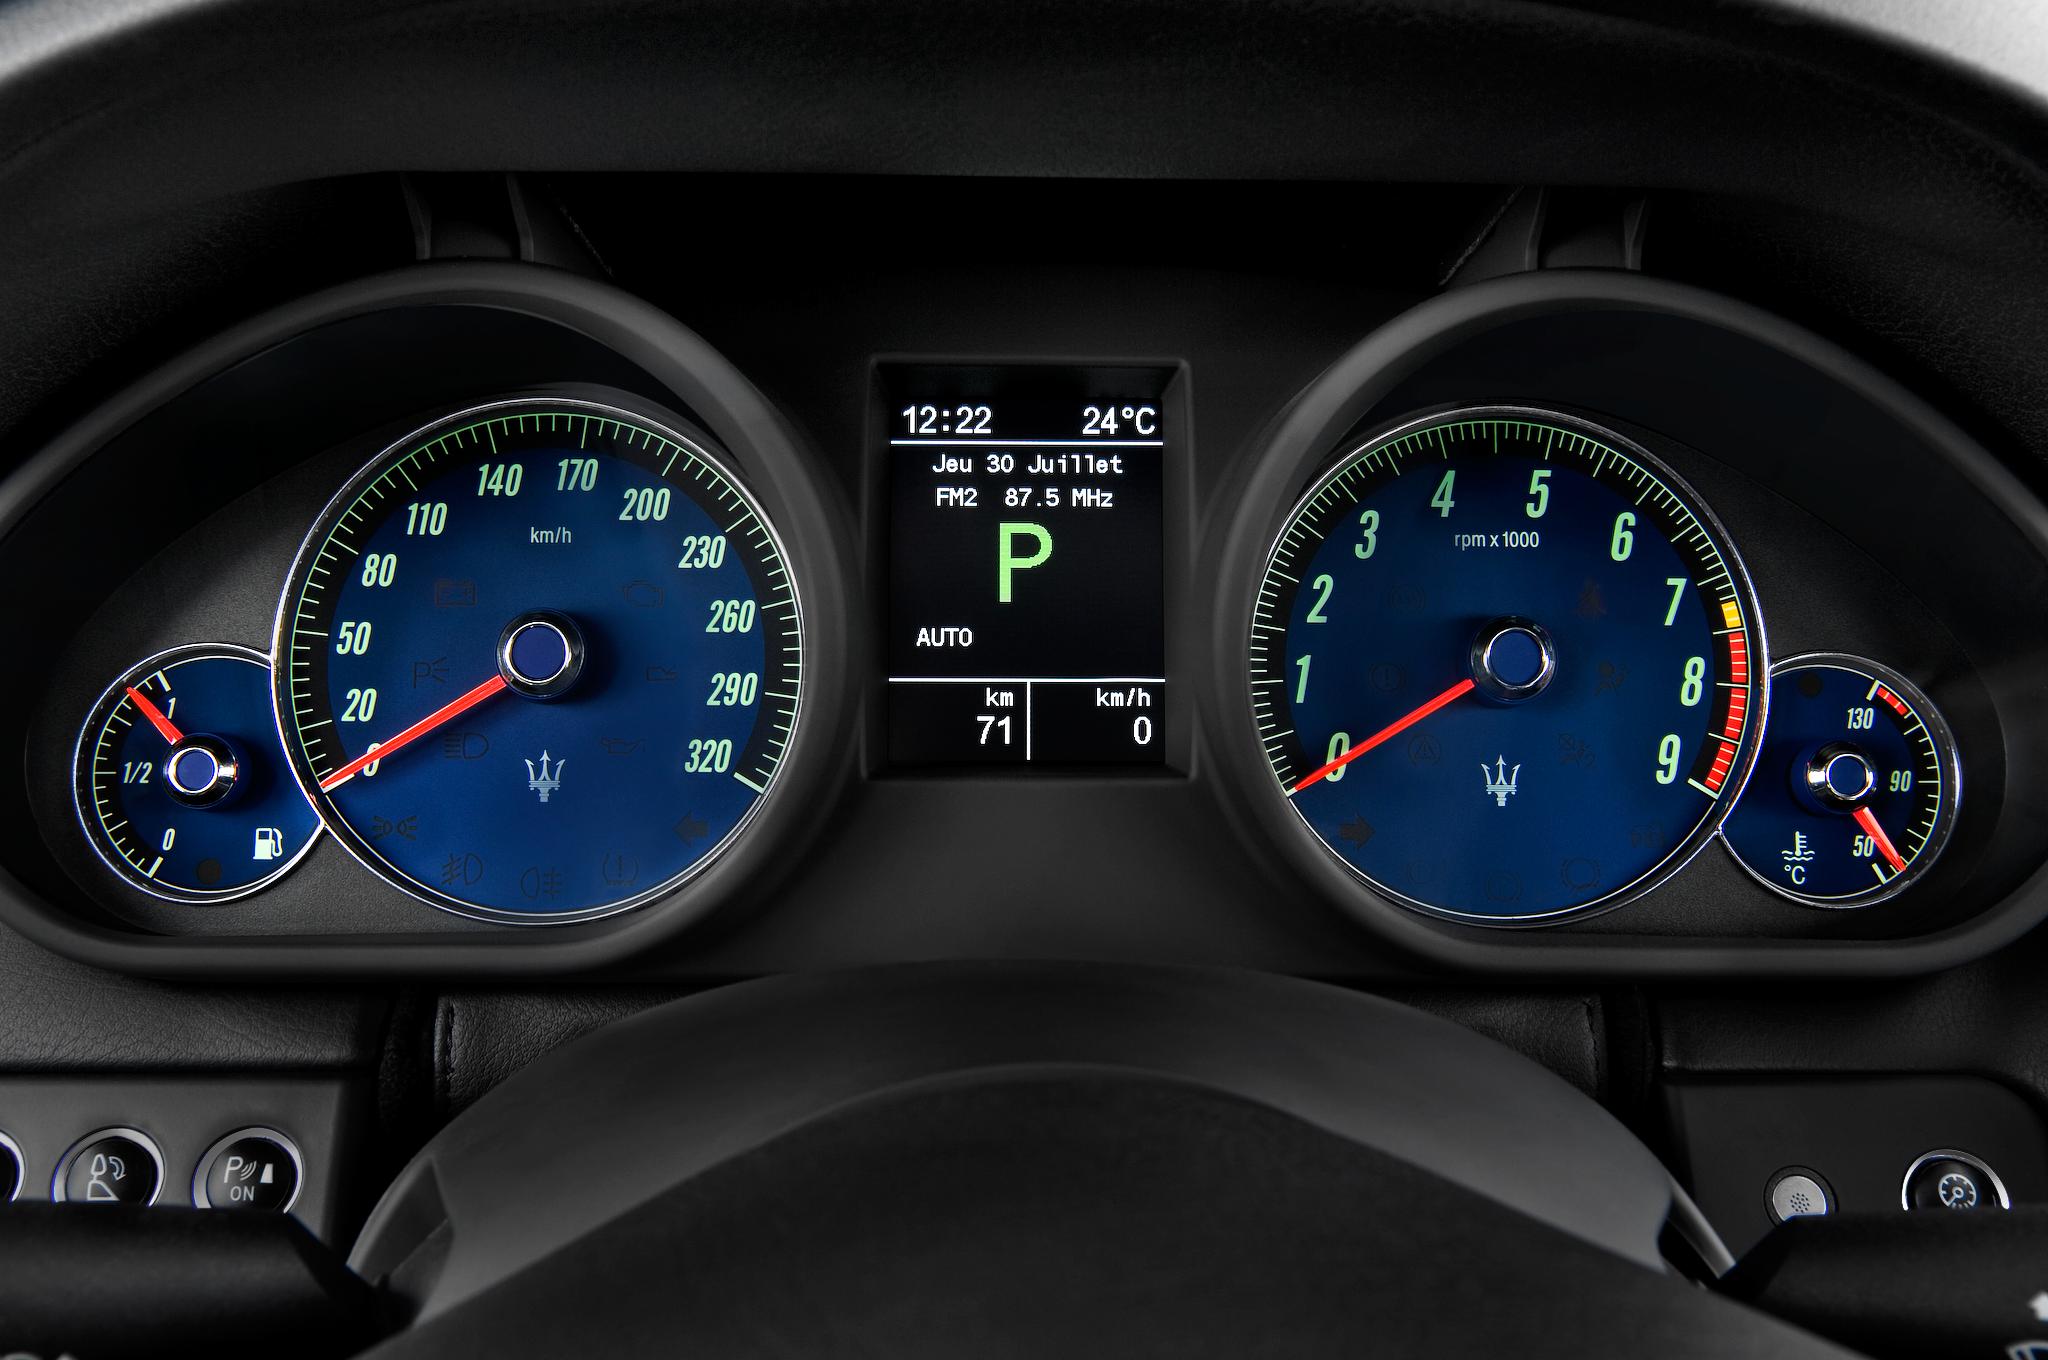 http://st.automobilemag.com/uploads/sites/10/2015/11/2012-maserati-quattroporte-s-sedan-instrument-cluster.png